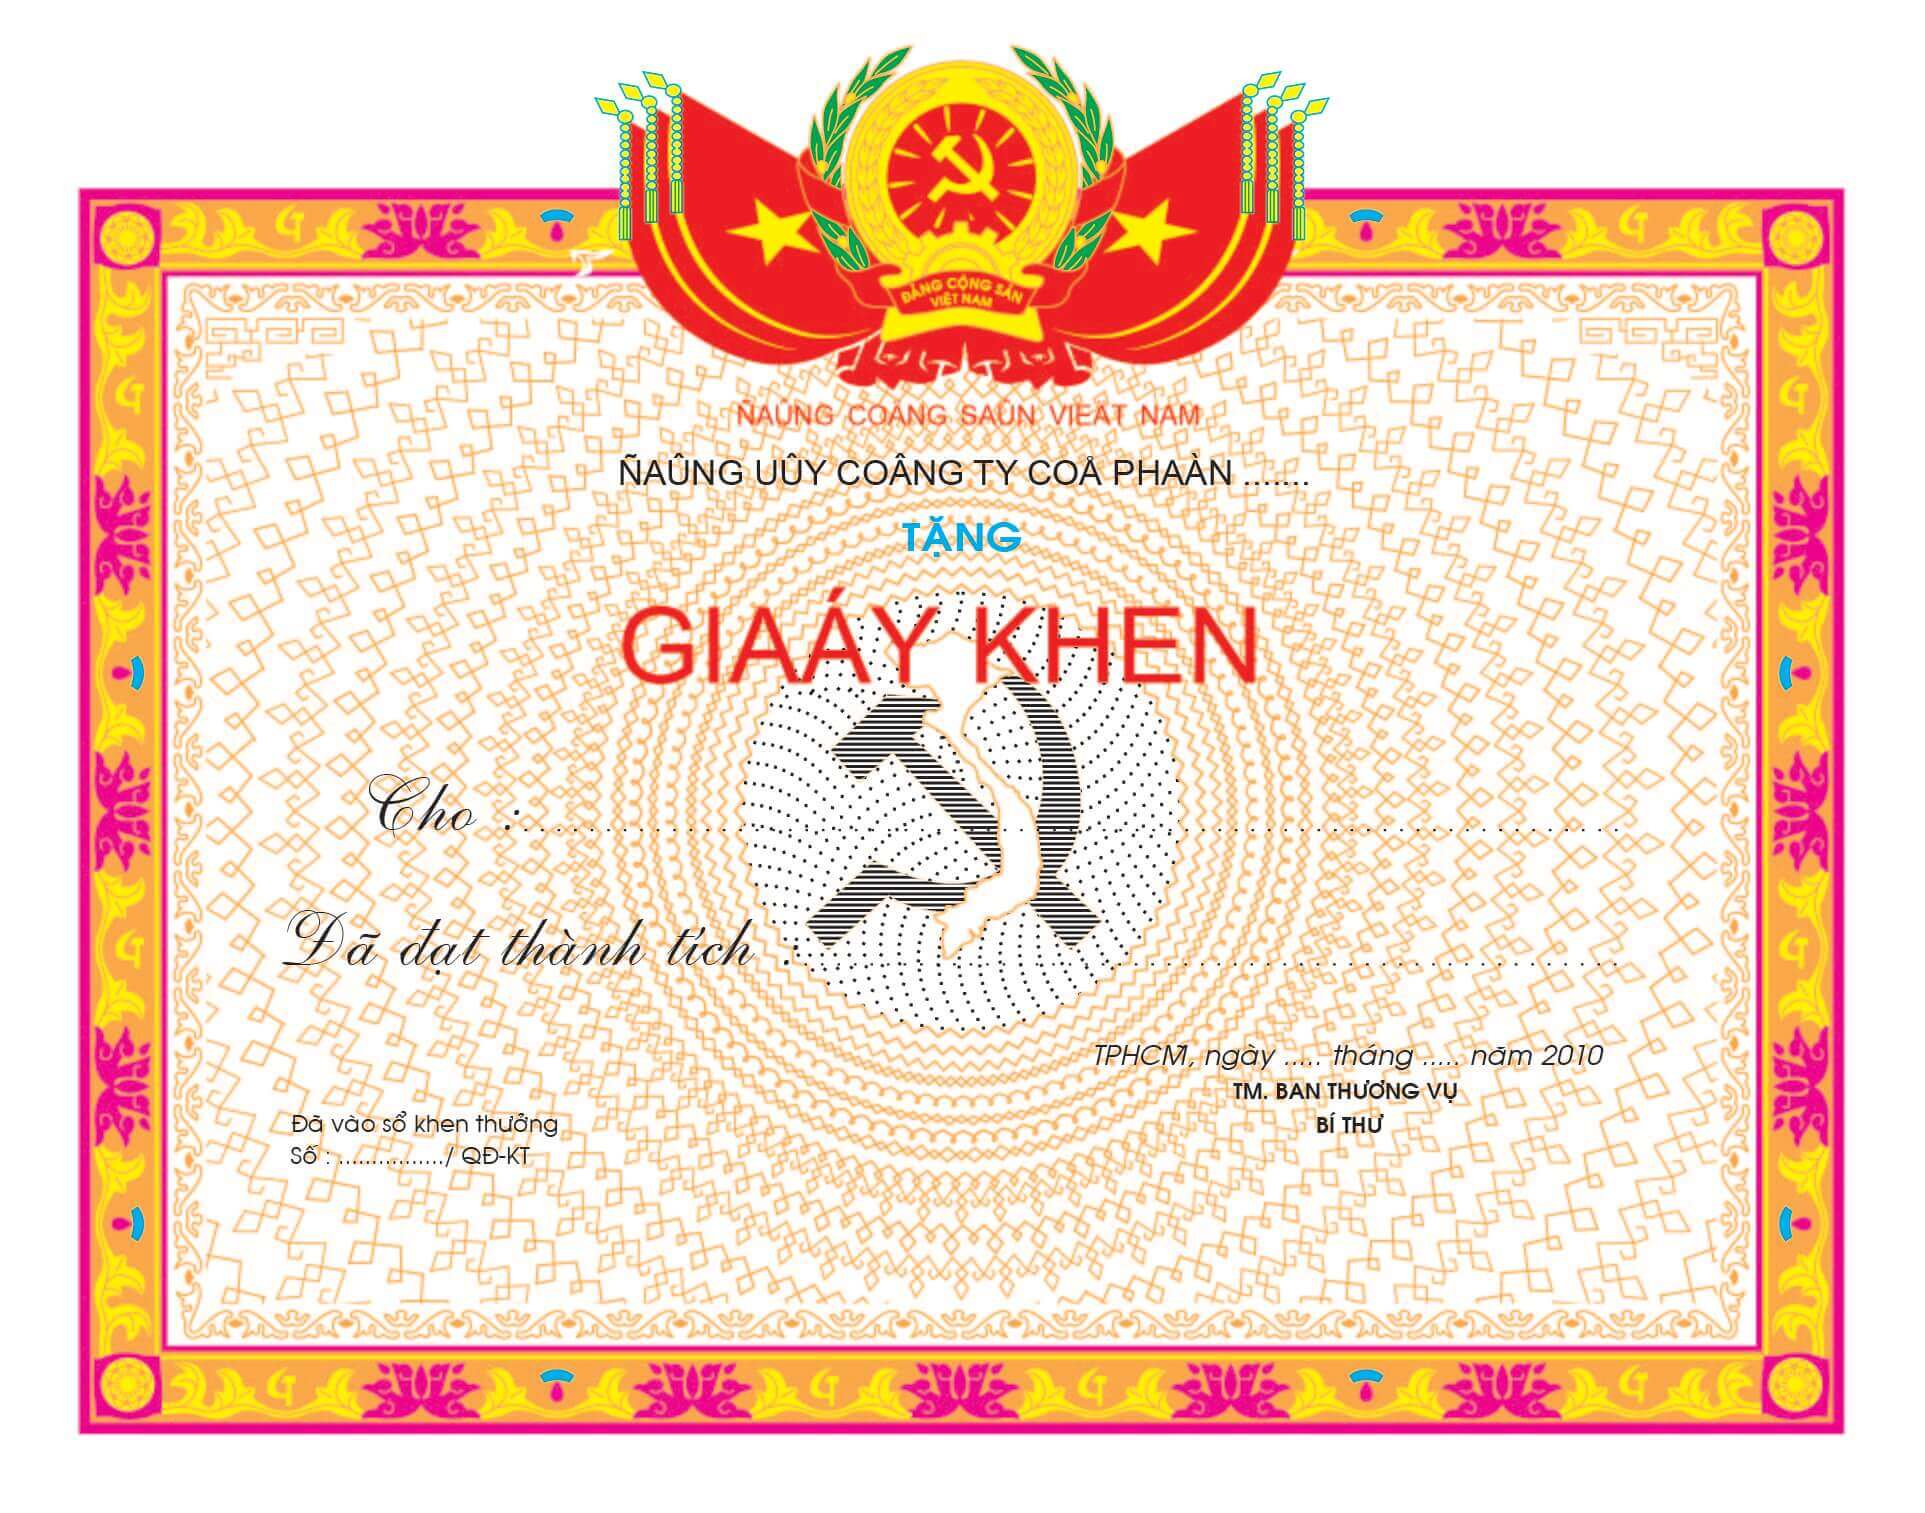 Mẫu giấy khen 004 - mẫu giấy khen Công Ty - Link Download : https://adsnew.net/LwfN